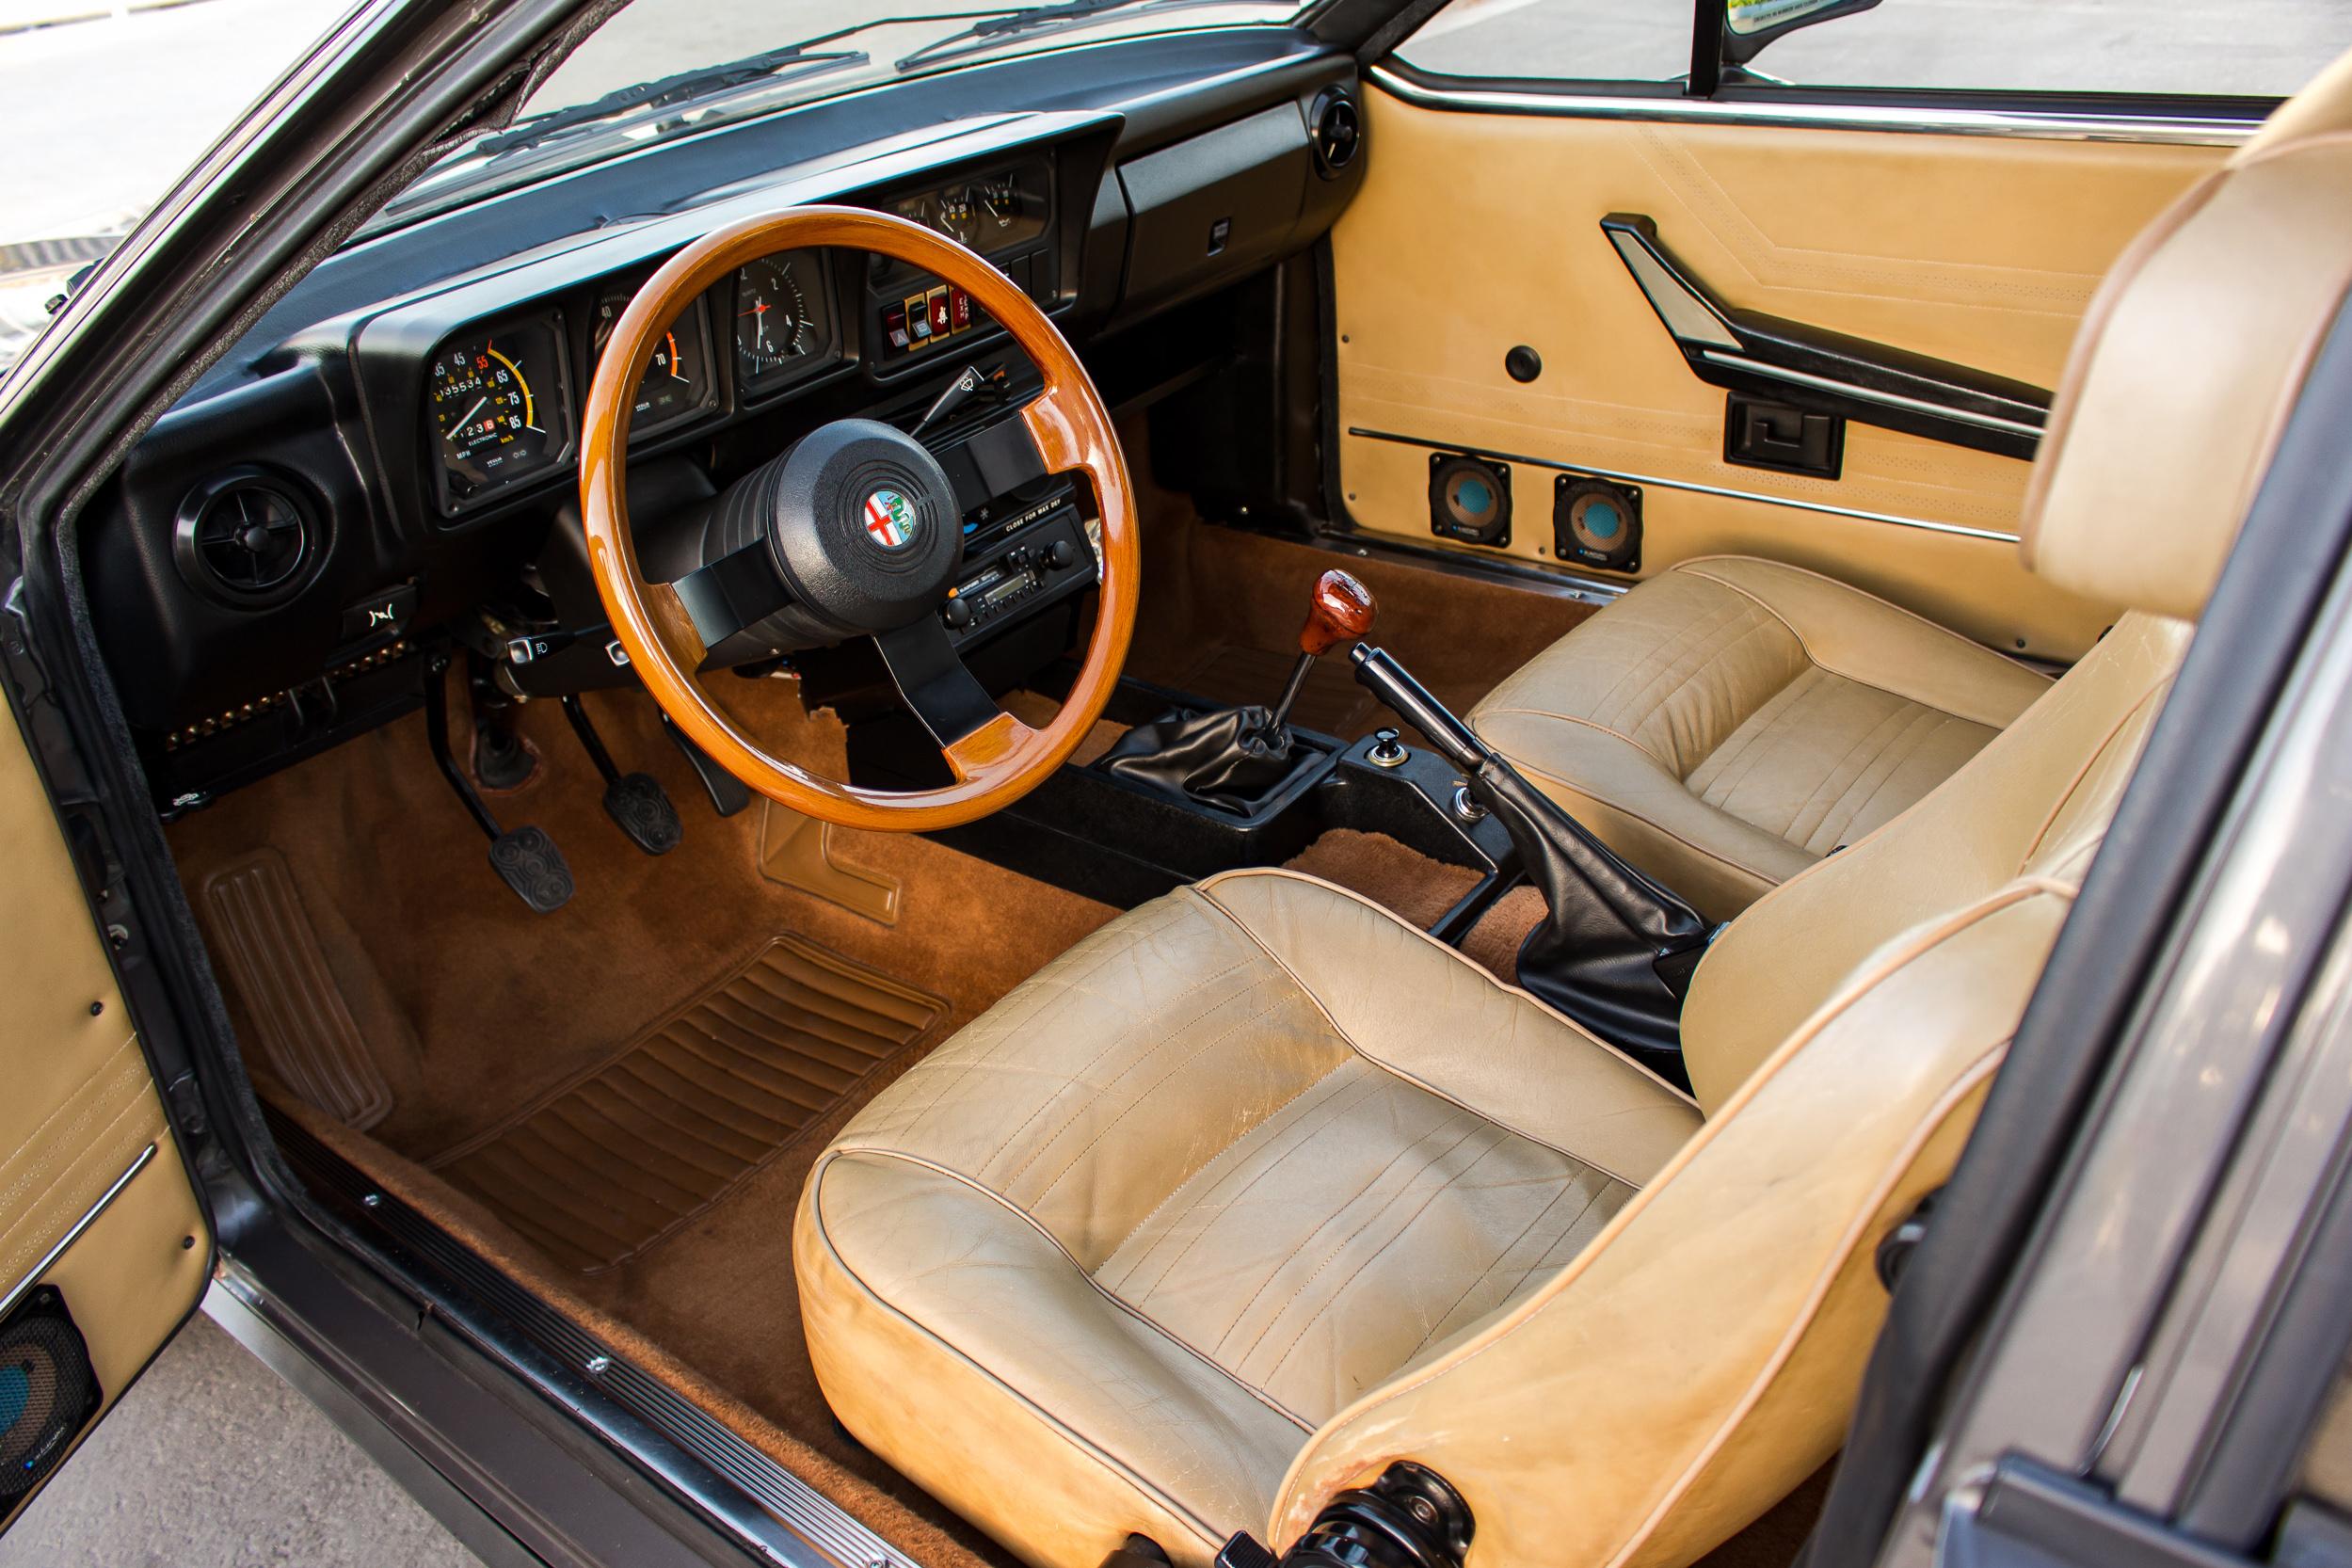 1981 Alfa Romeo GTV 6 2.5 interior